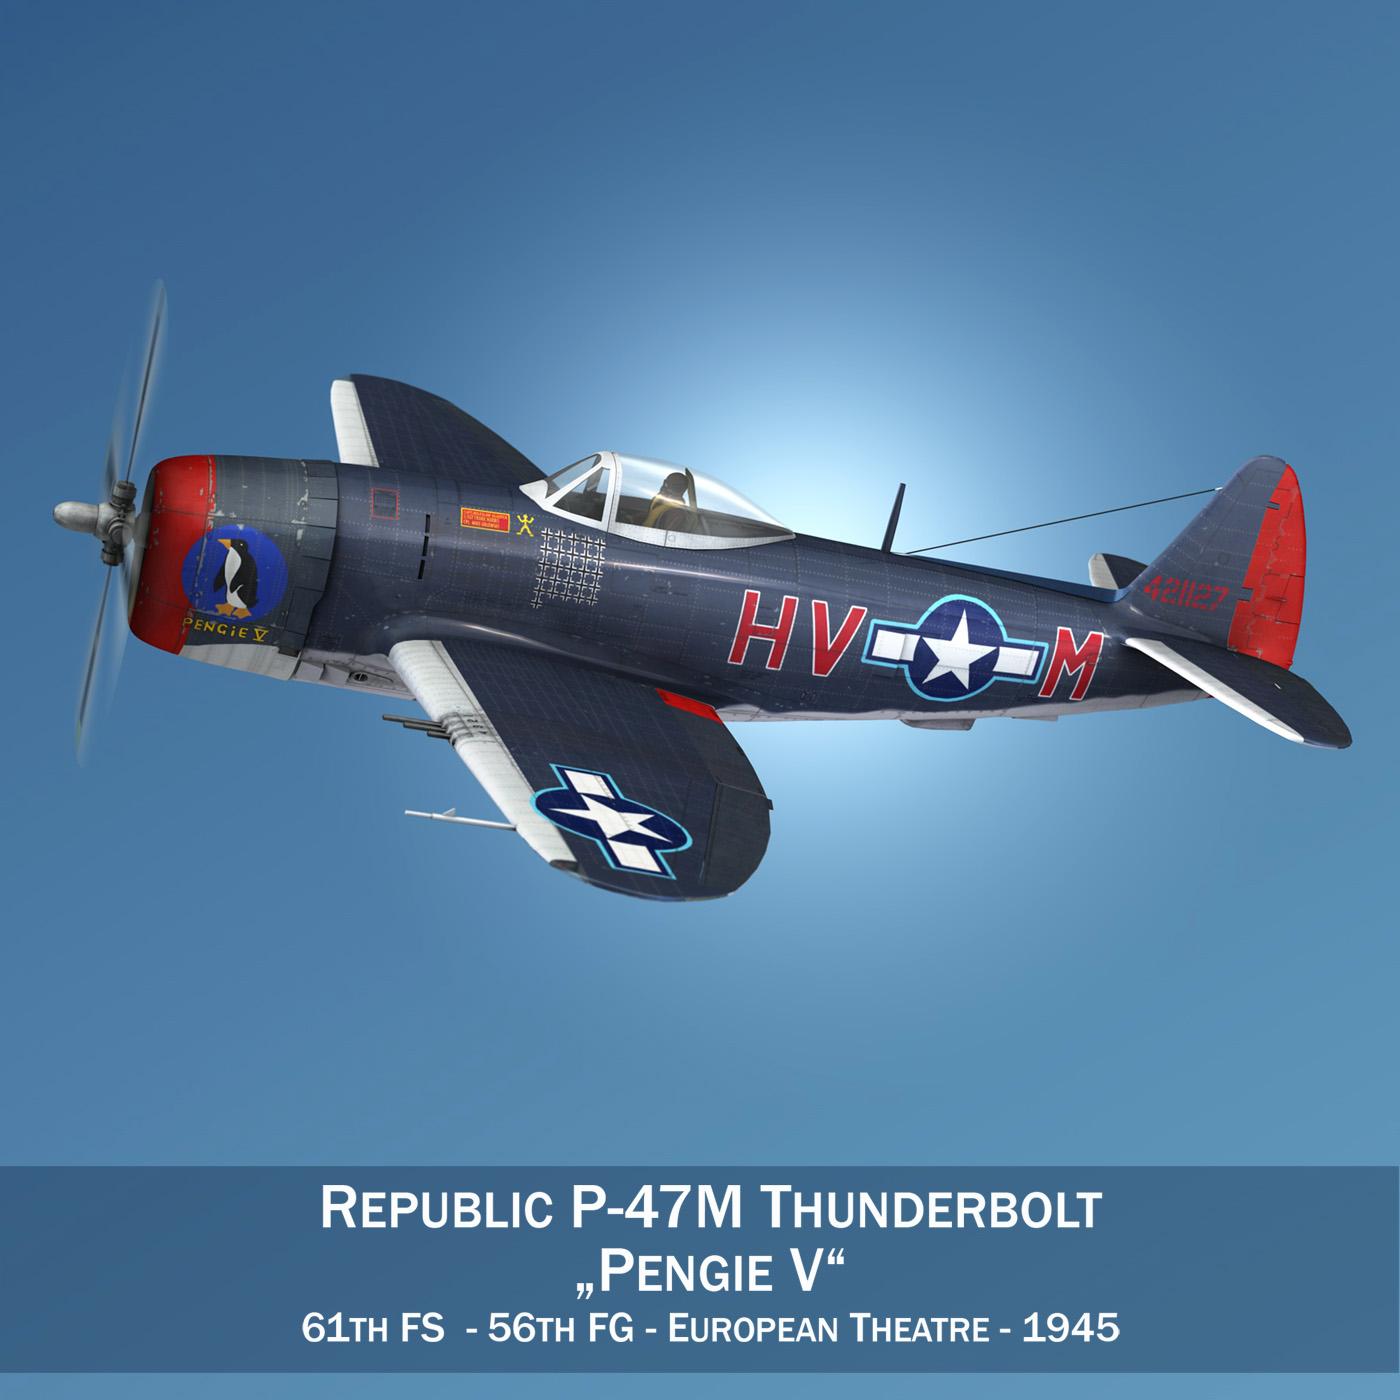 republic p-47m thunderbolt – pengie v 3d model 3ds c4d fbx lwo lw lws obj 279714